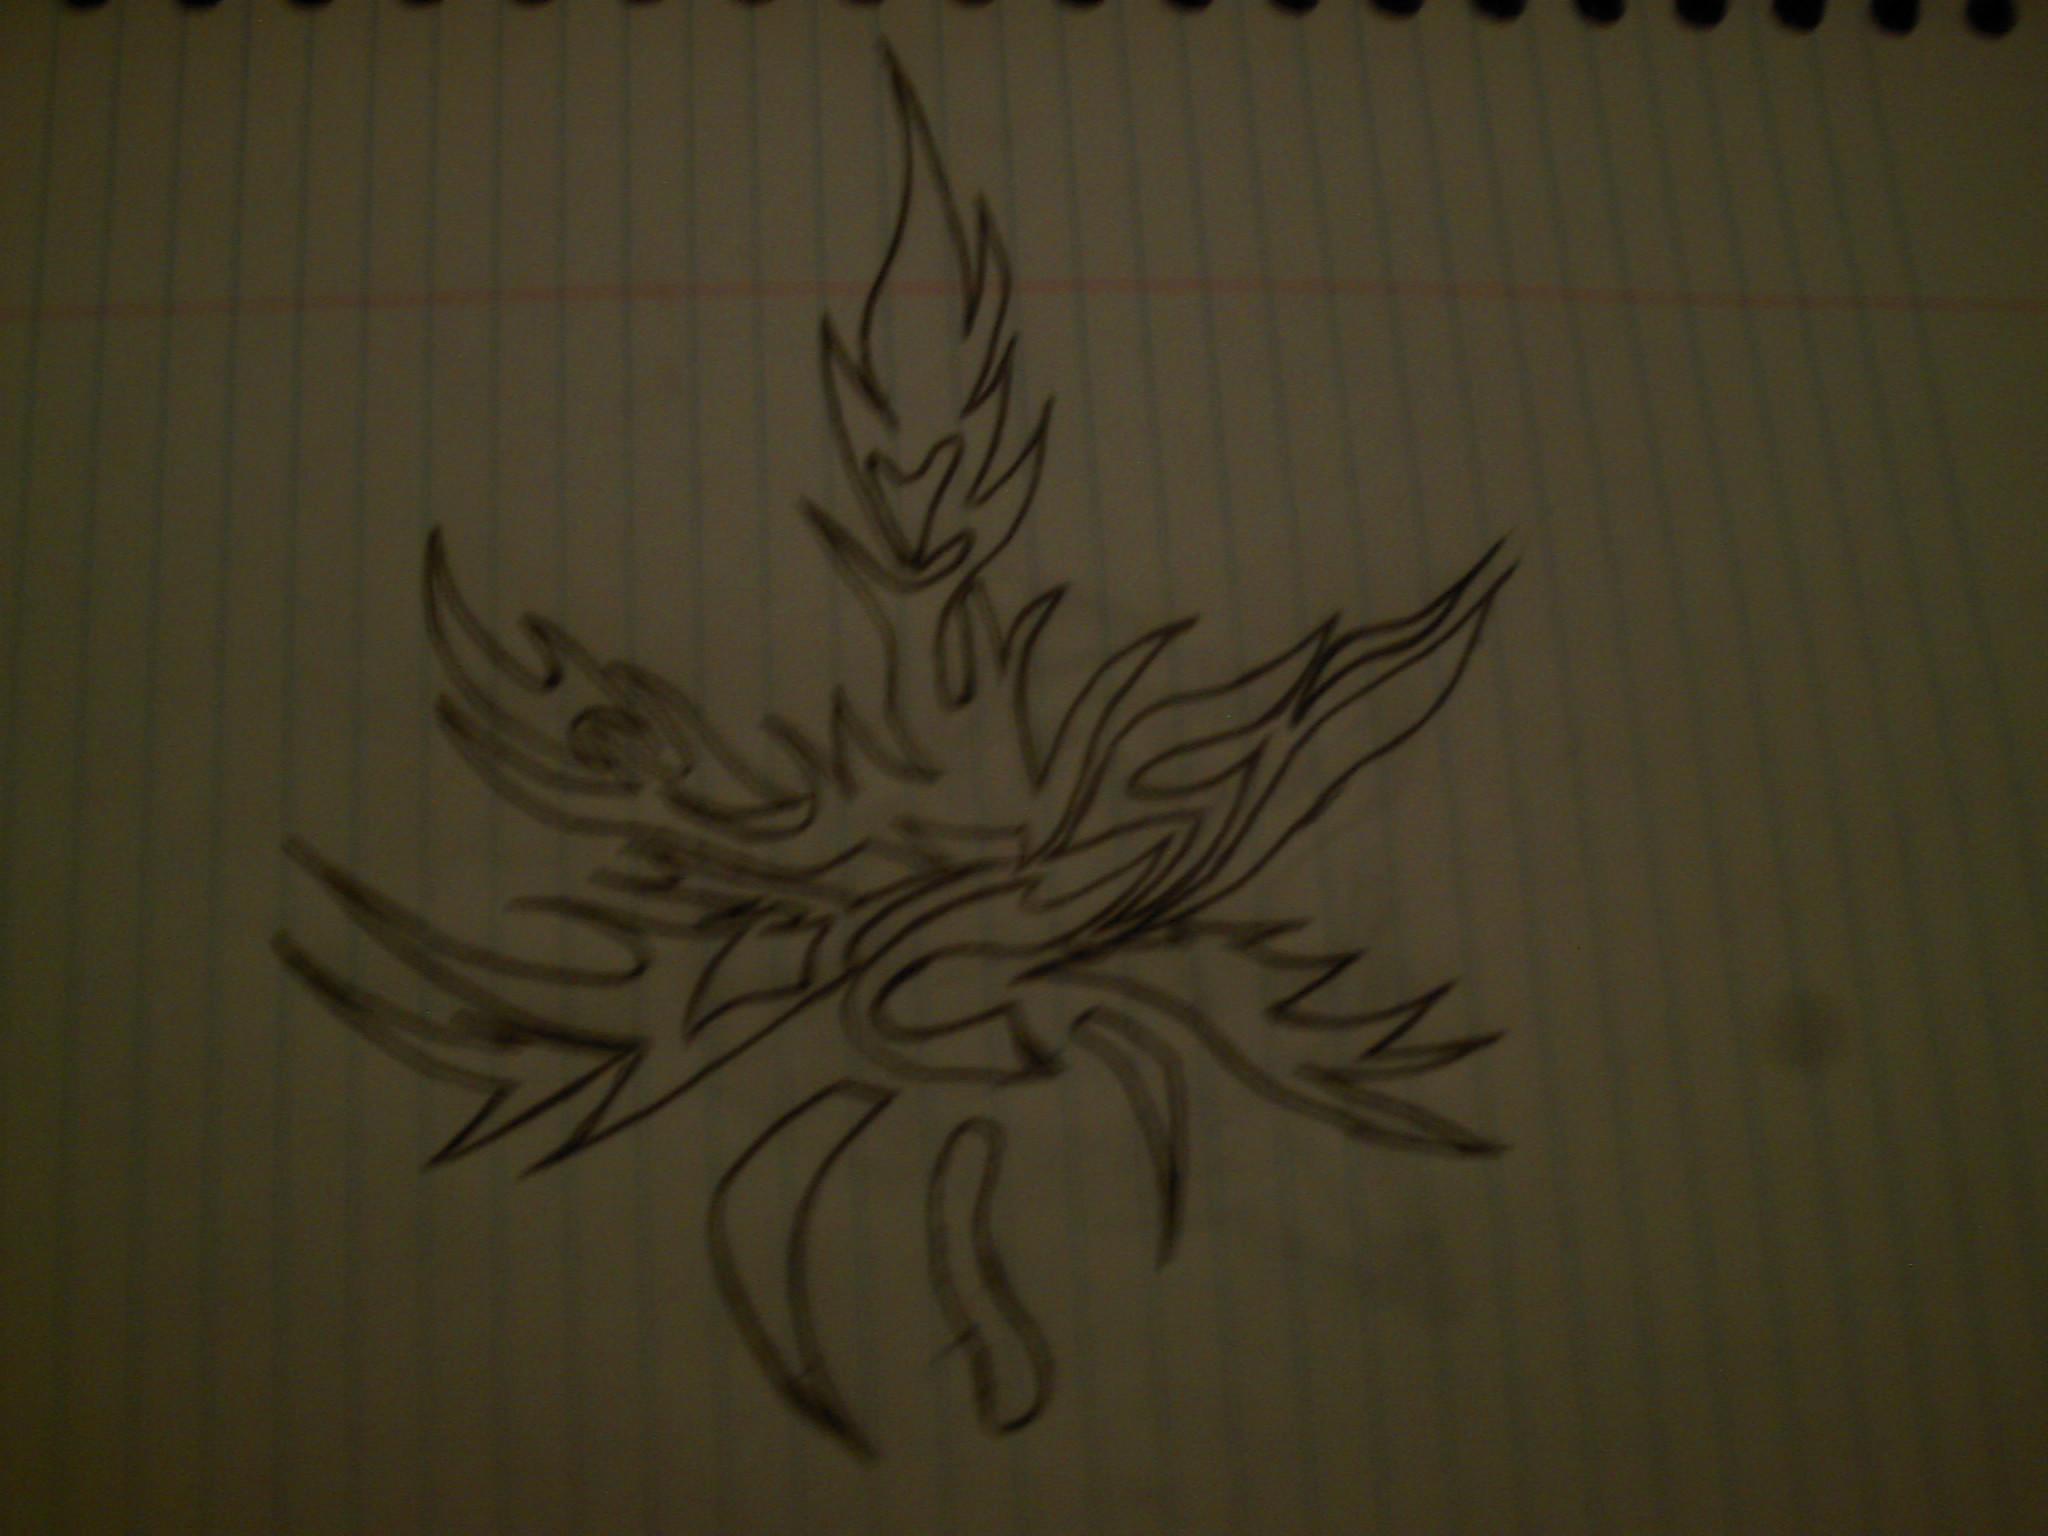 Drawn pot plant tribal On deathbyvomit plant by DeviantArt